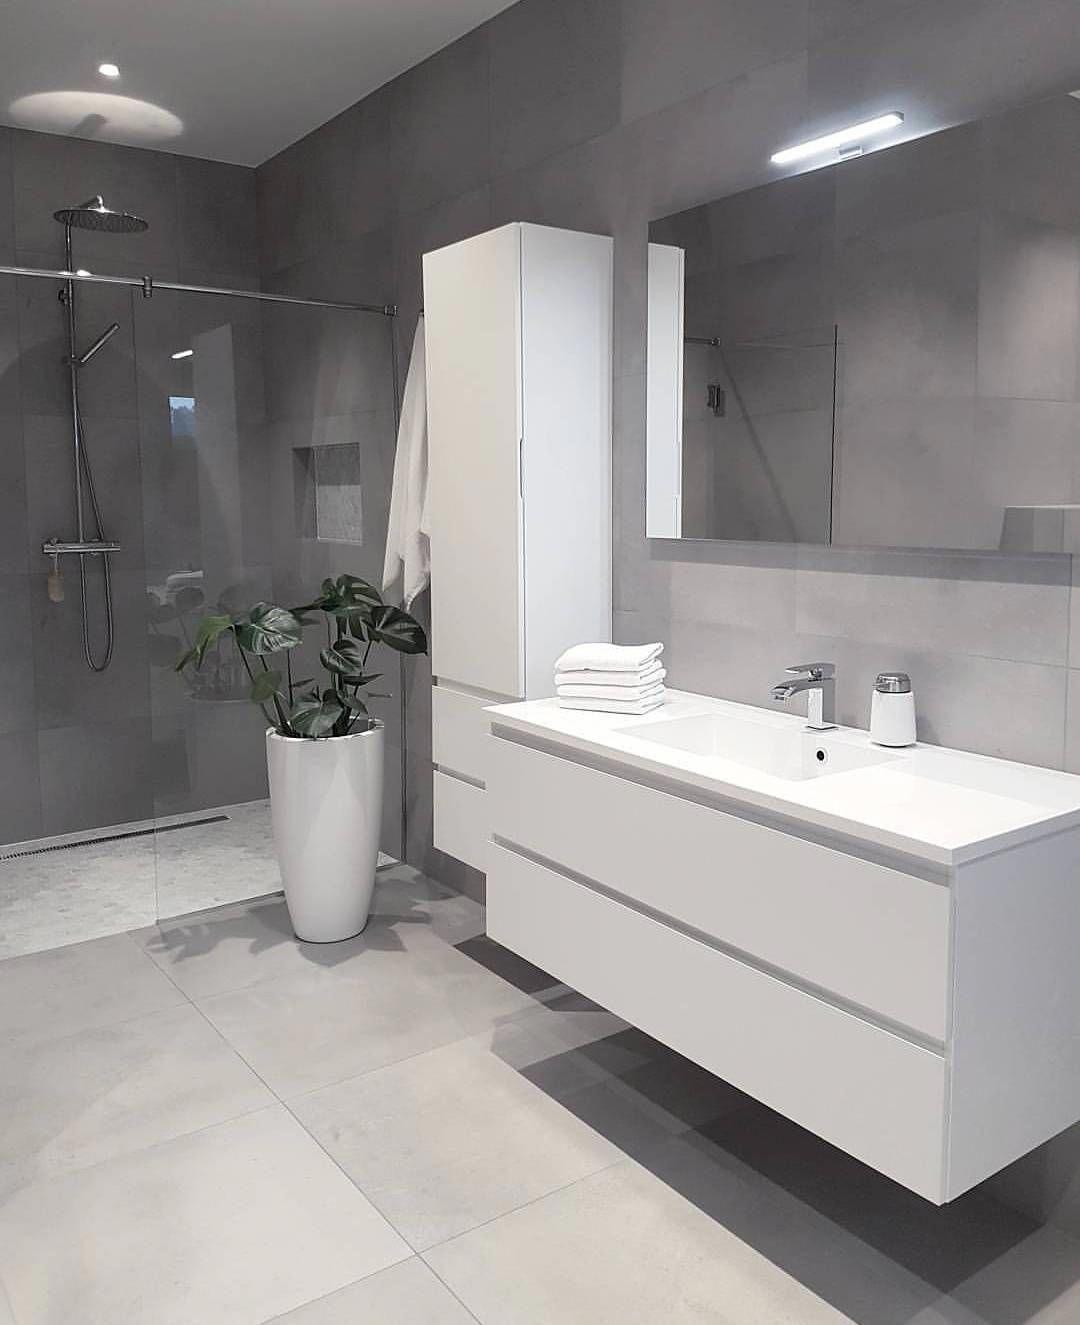 4 Piece Ceramic Bathroom Accessory Set White With Black Lines